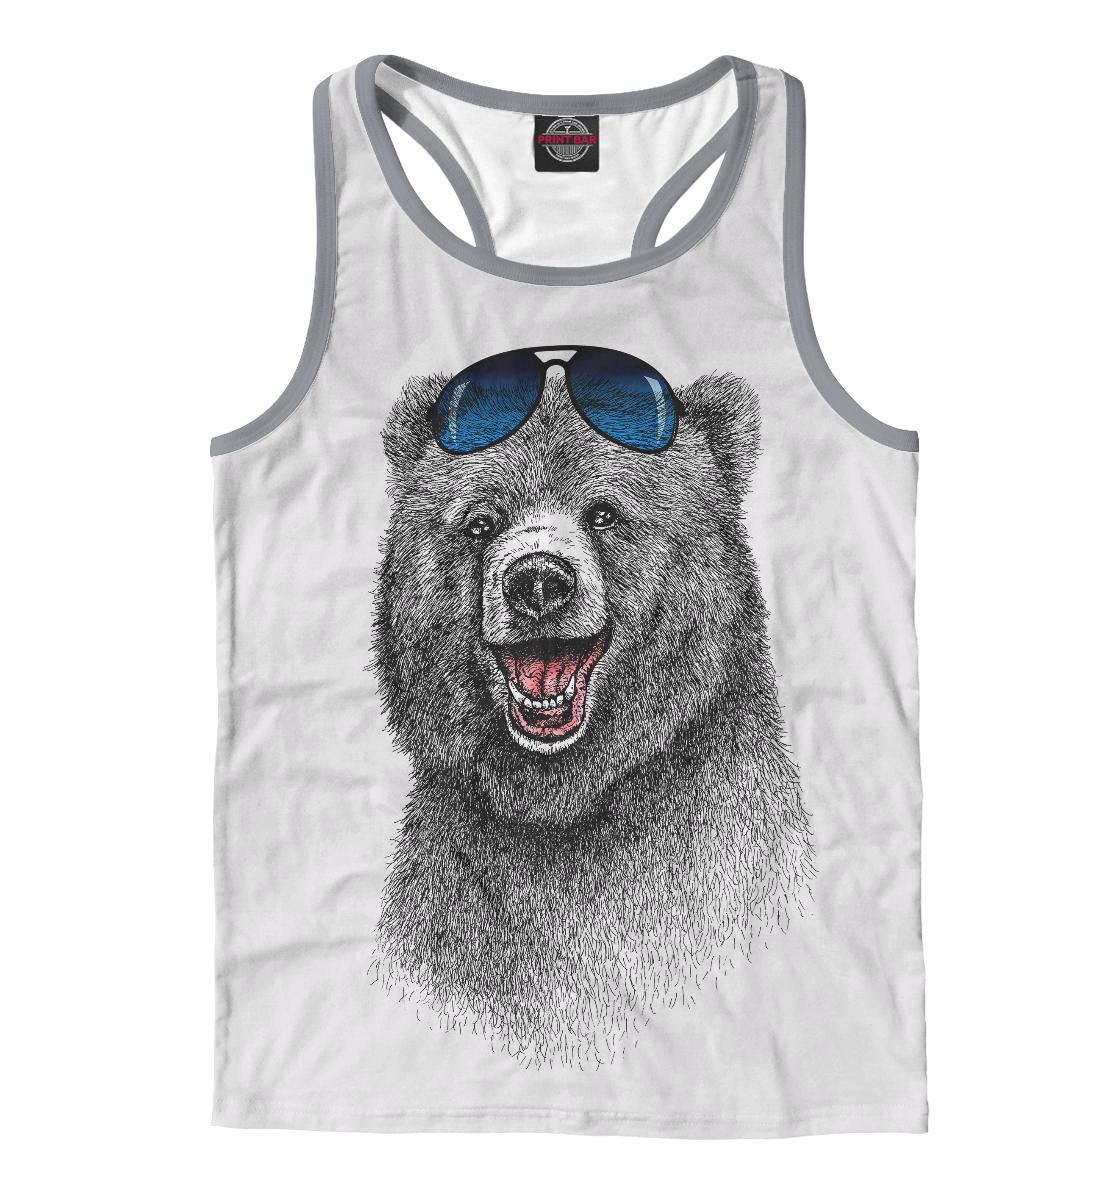 Купить Счастливый медведь, Printbar, Майки борцовки, MED-397090-mayb-2